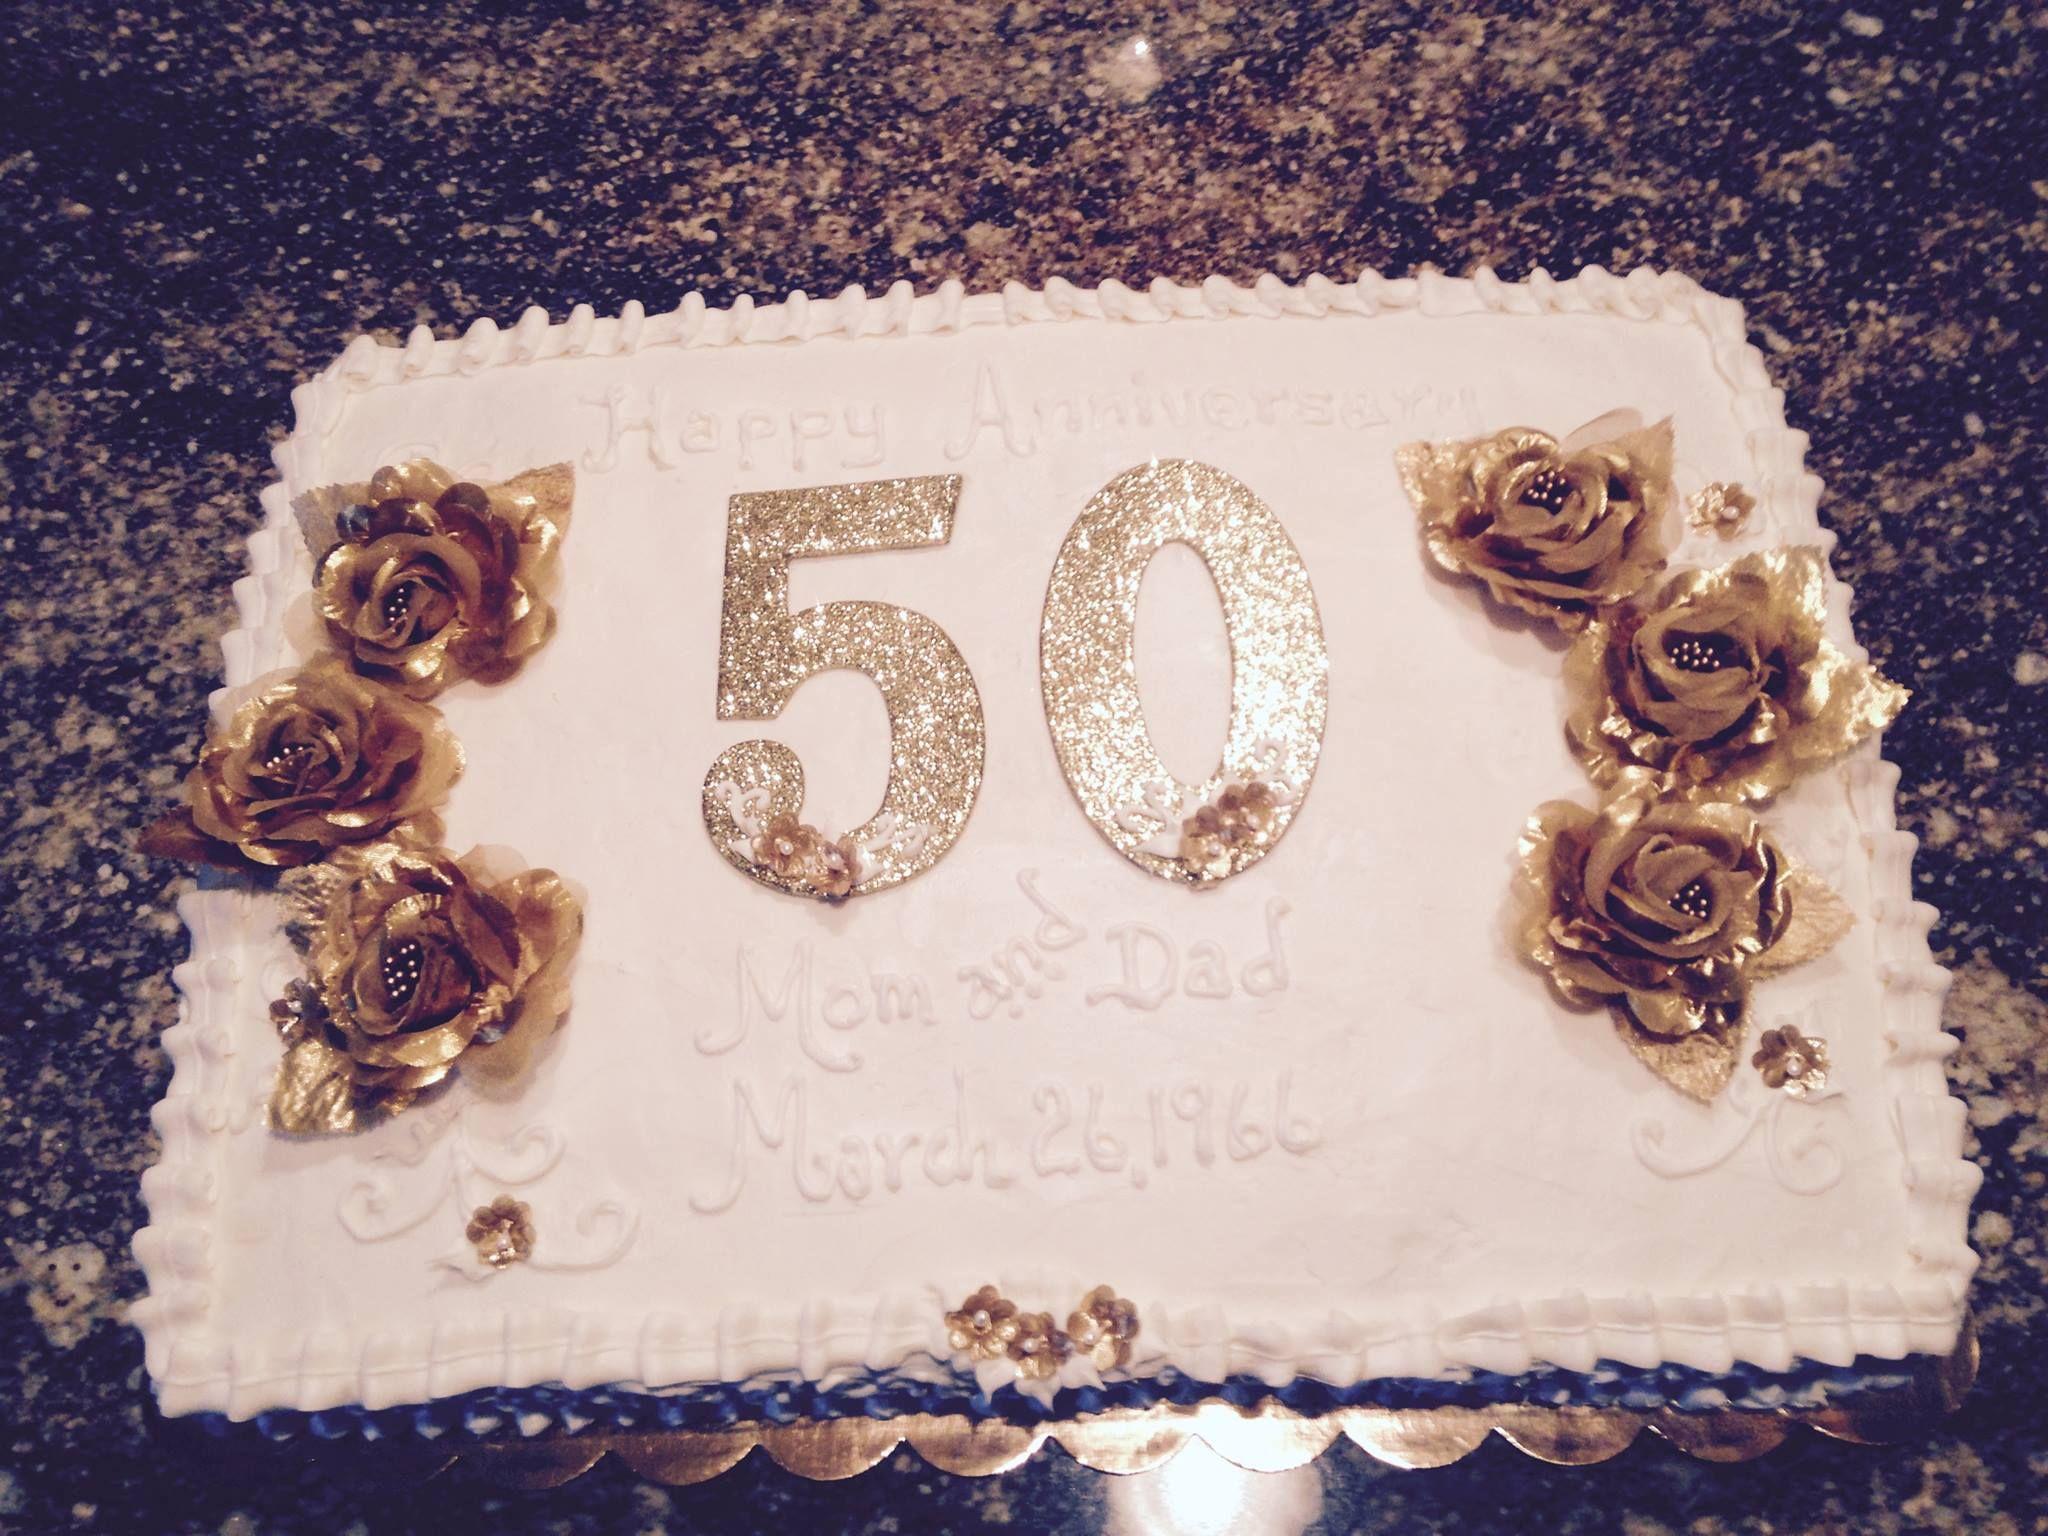 50th Wedding Anniversary Sheet Cake Ideas - The Best Cake Of 2018